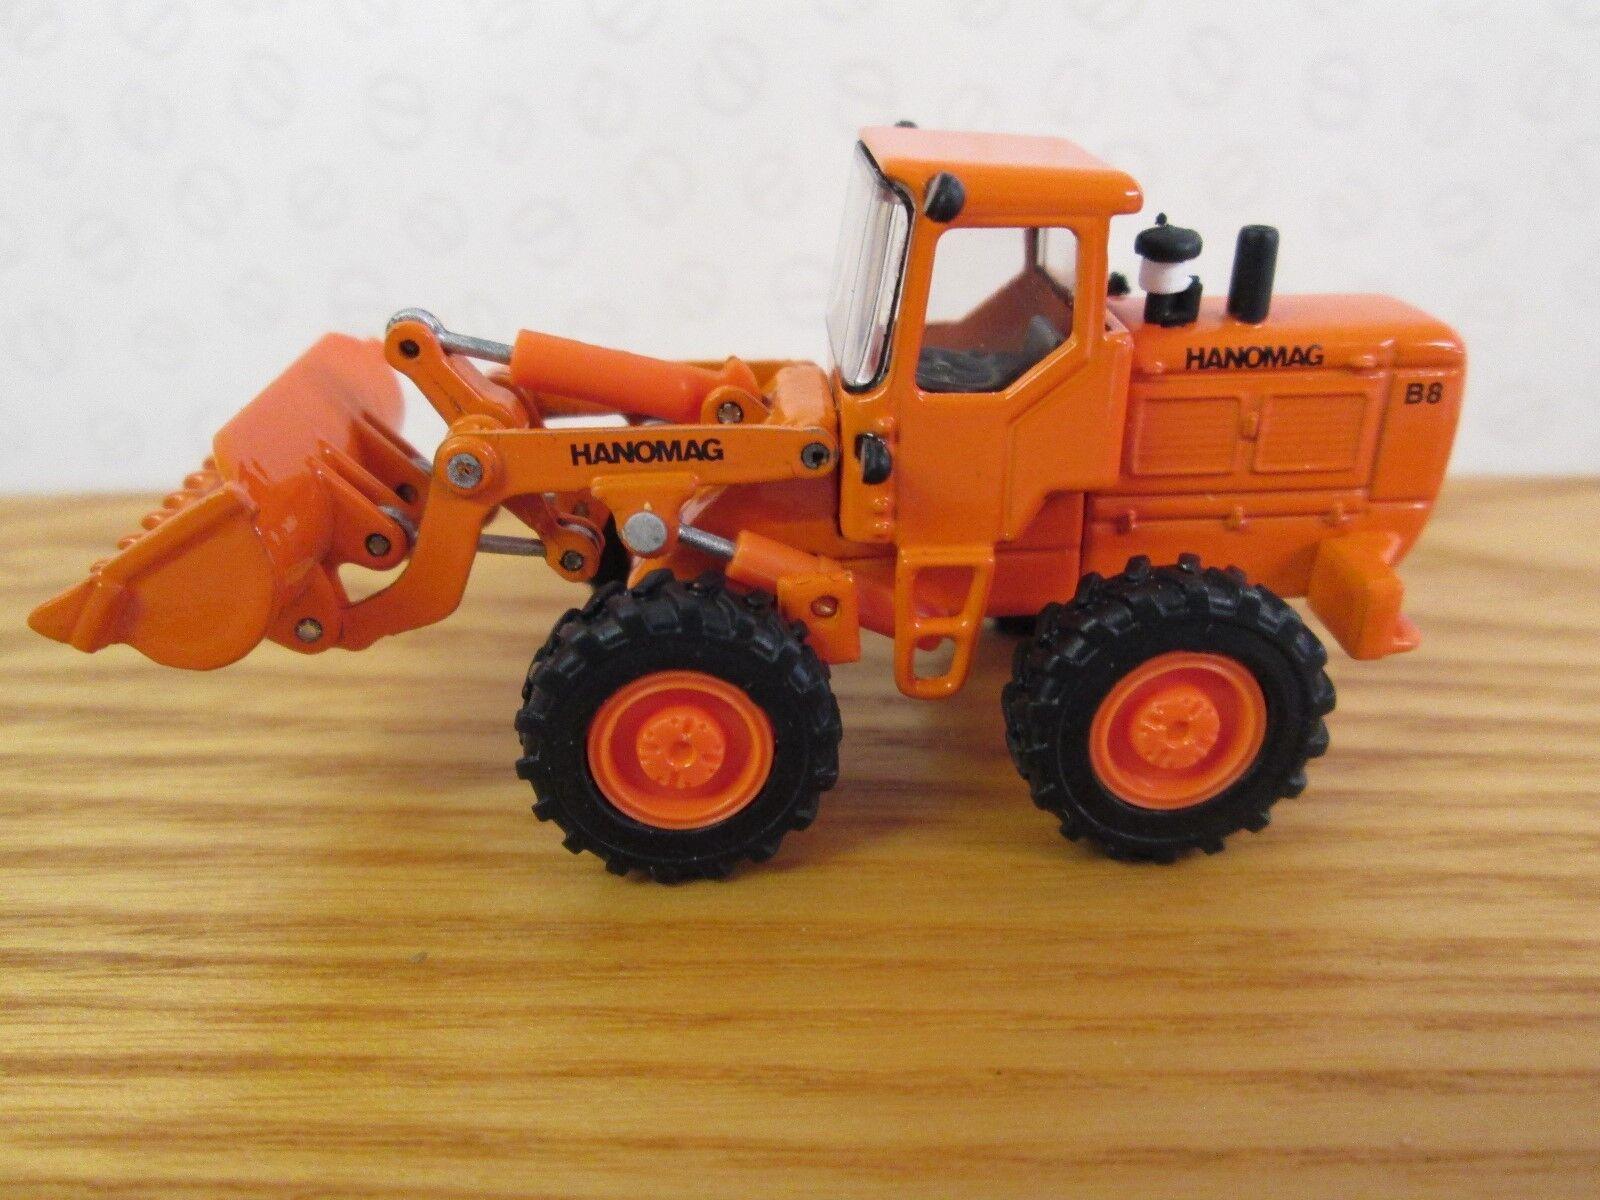 NZG. Hanomag B8 Radlader. 1 87. No 599. Orange